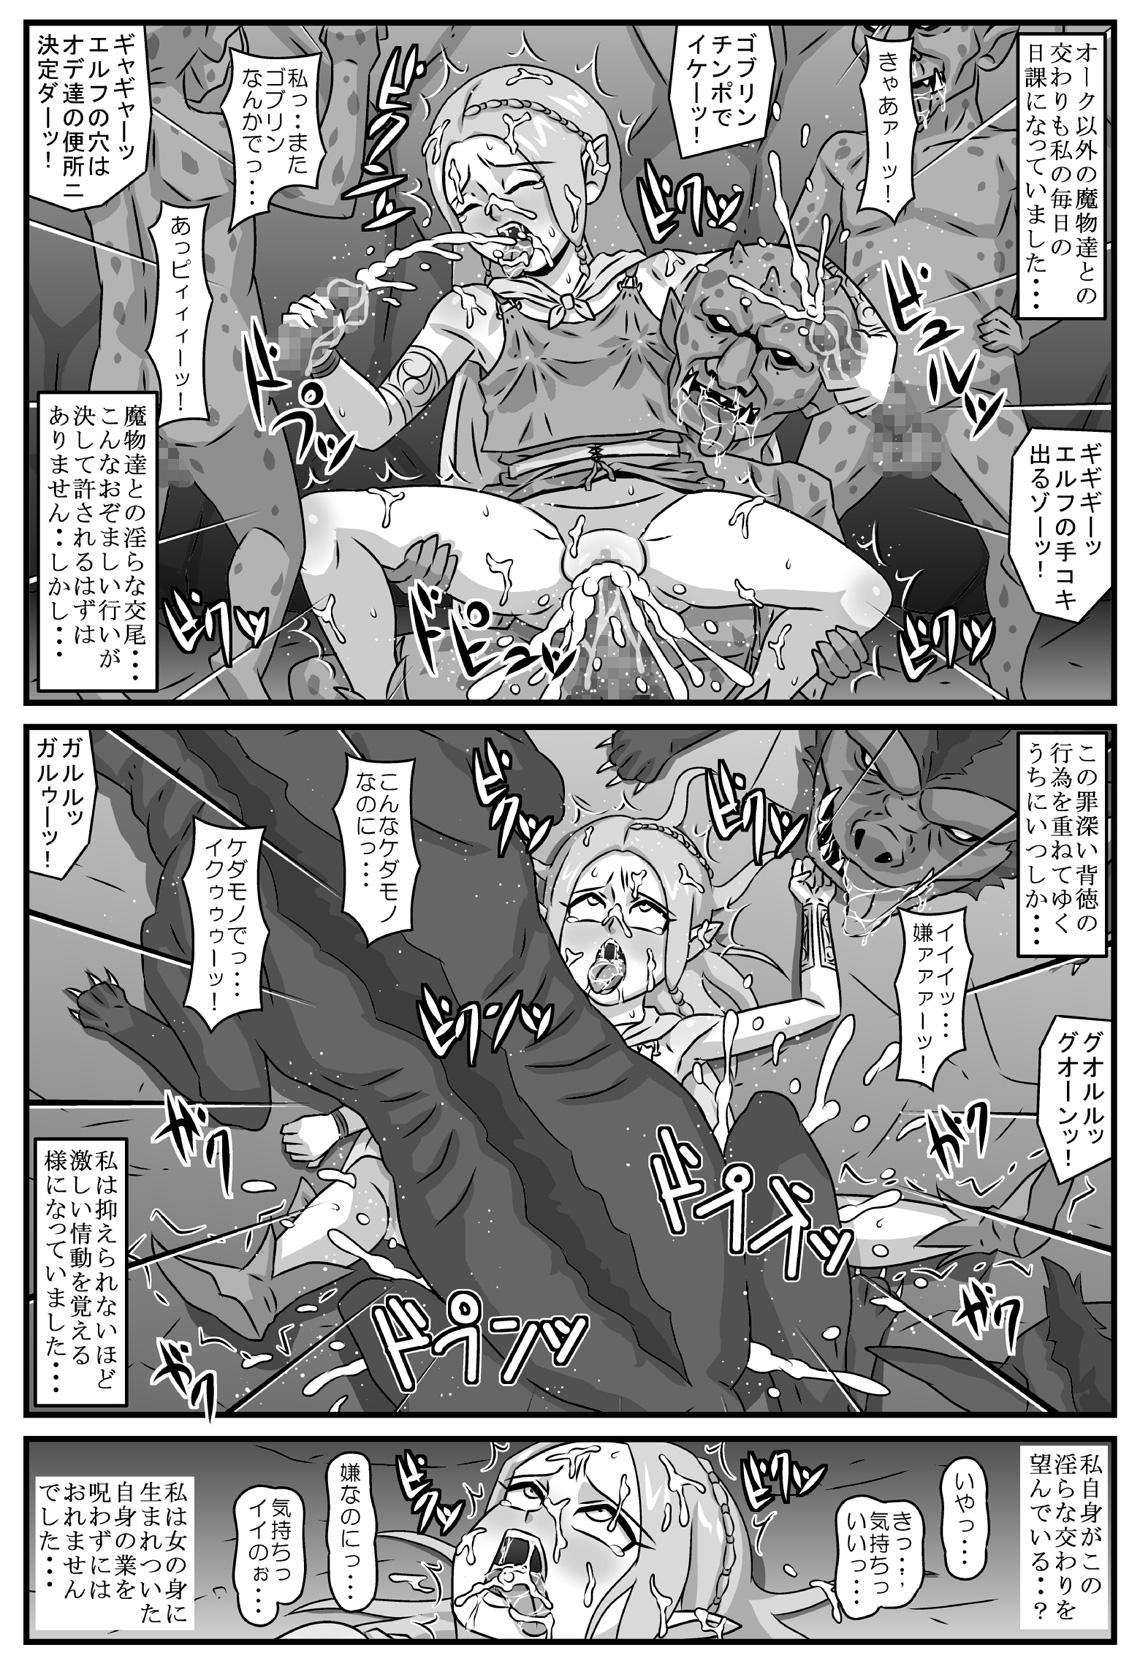 Elf Rinkan ~Kijin-tachi no Seien 24